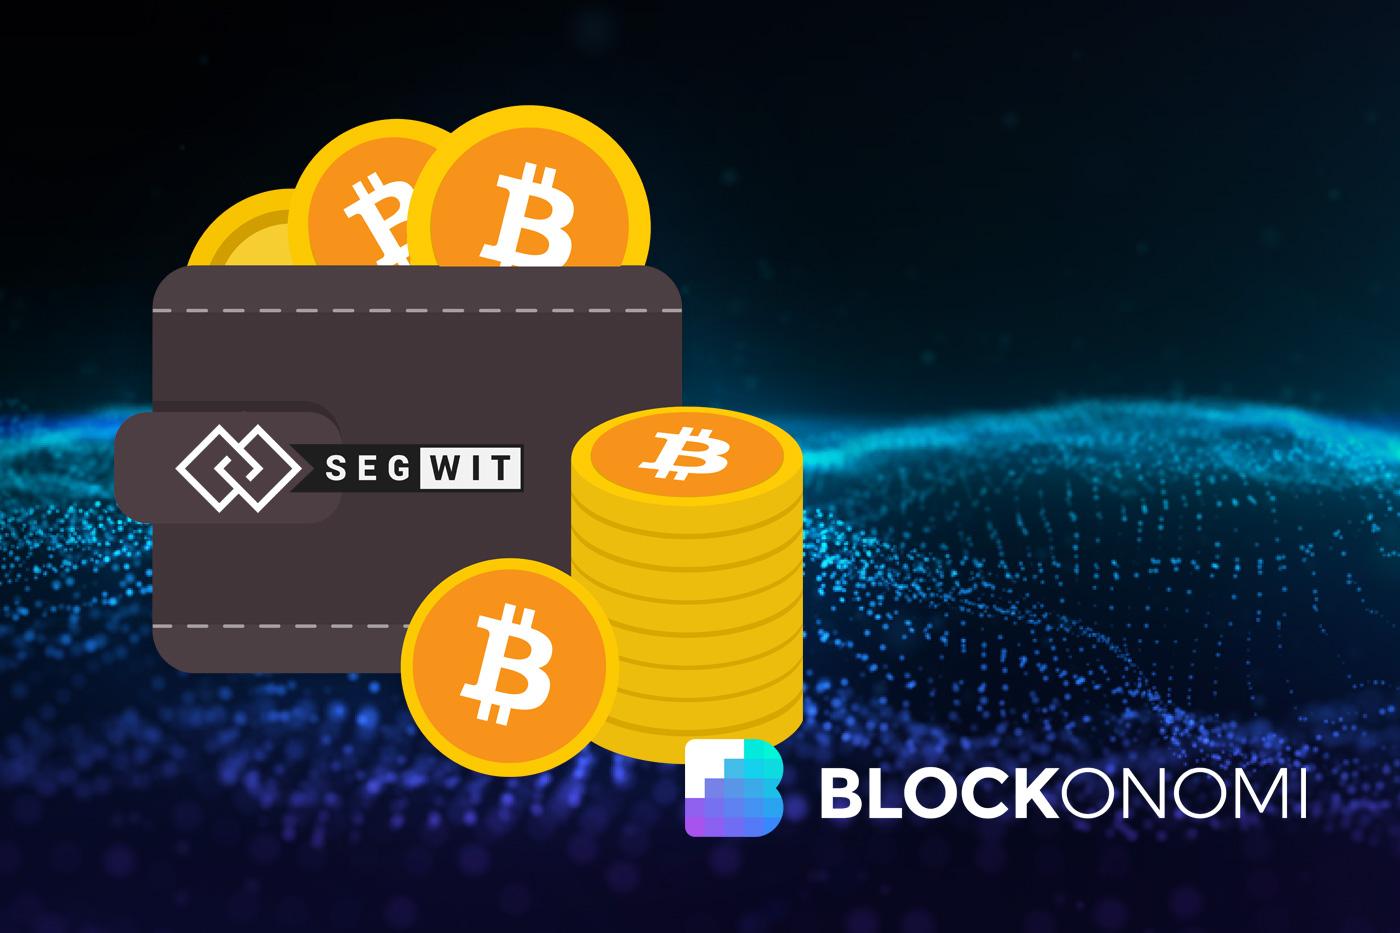 Segwit Bitcoin Wallets